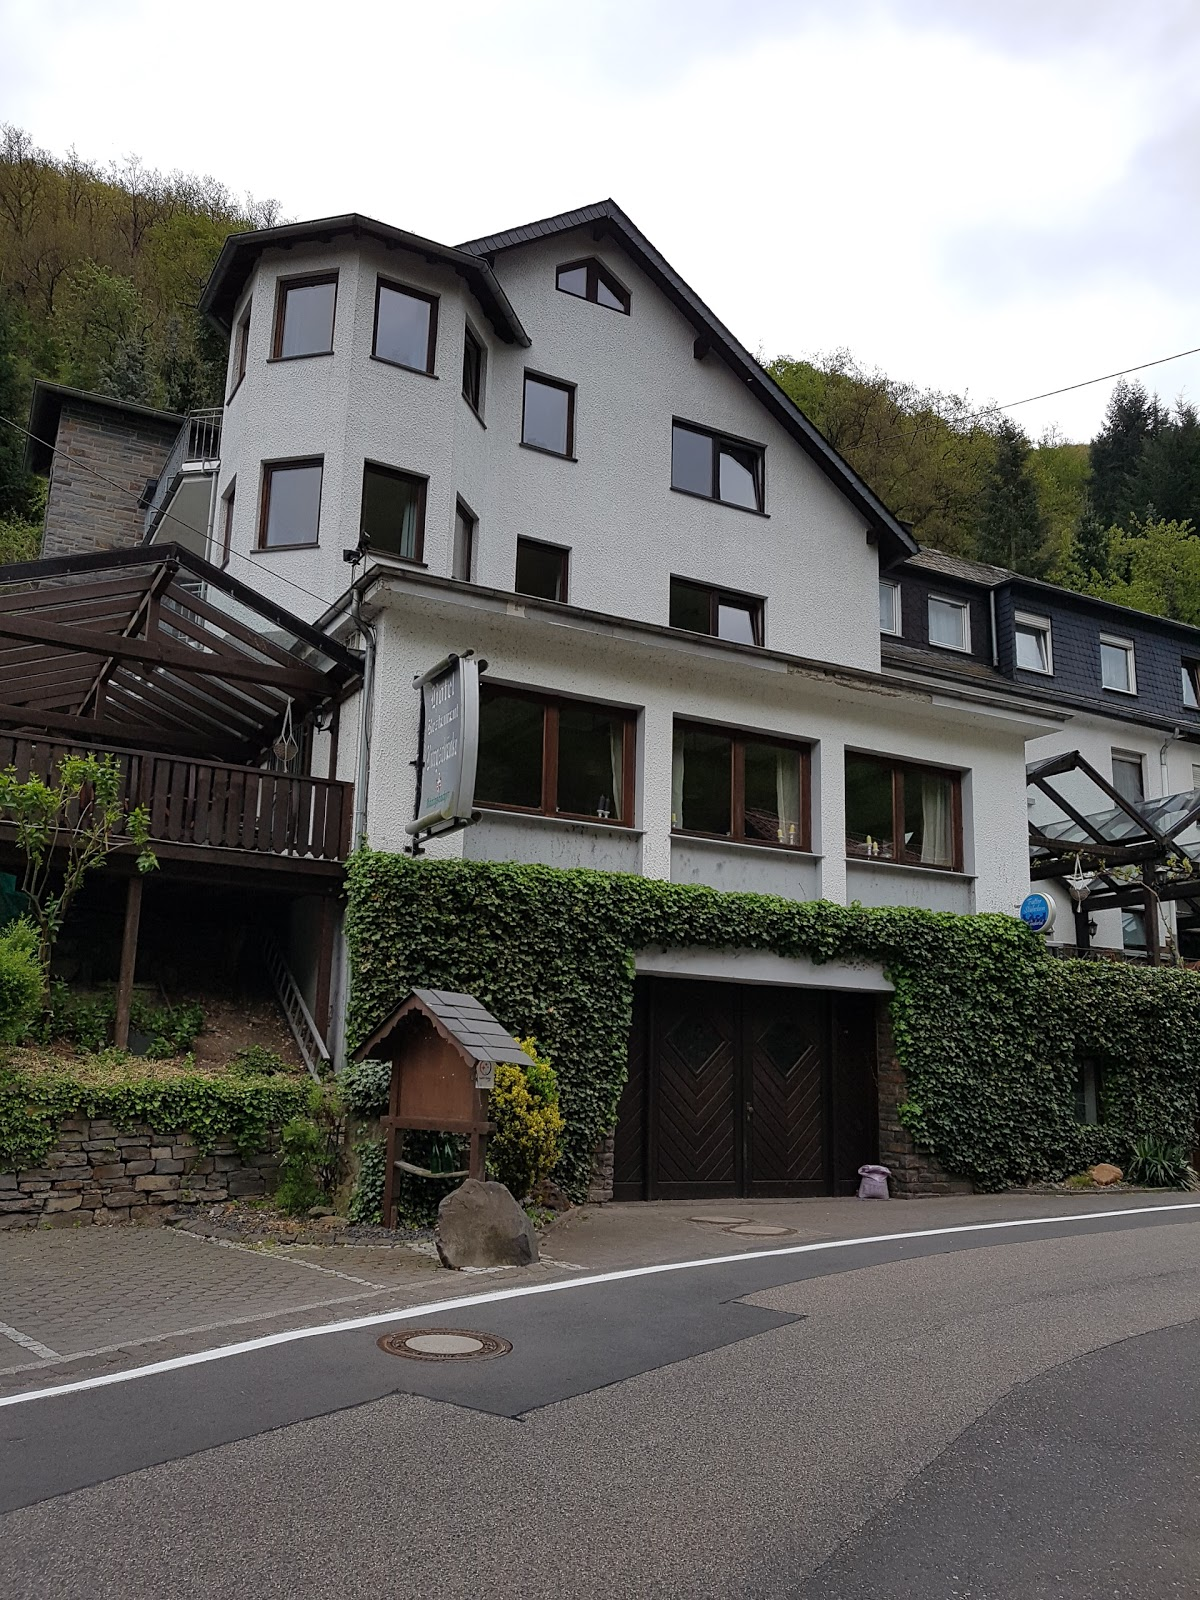 Privatpension Maeder - Koblenz, Germany - Tripcarta